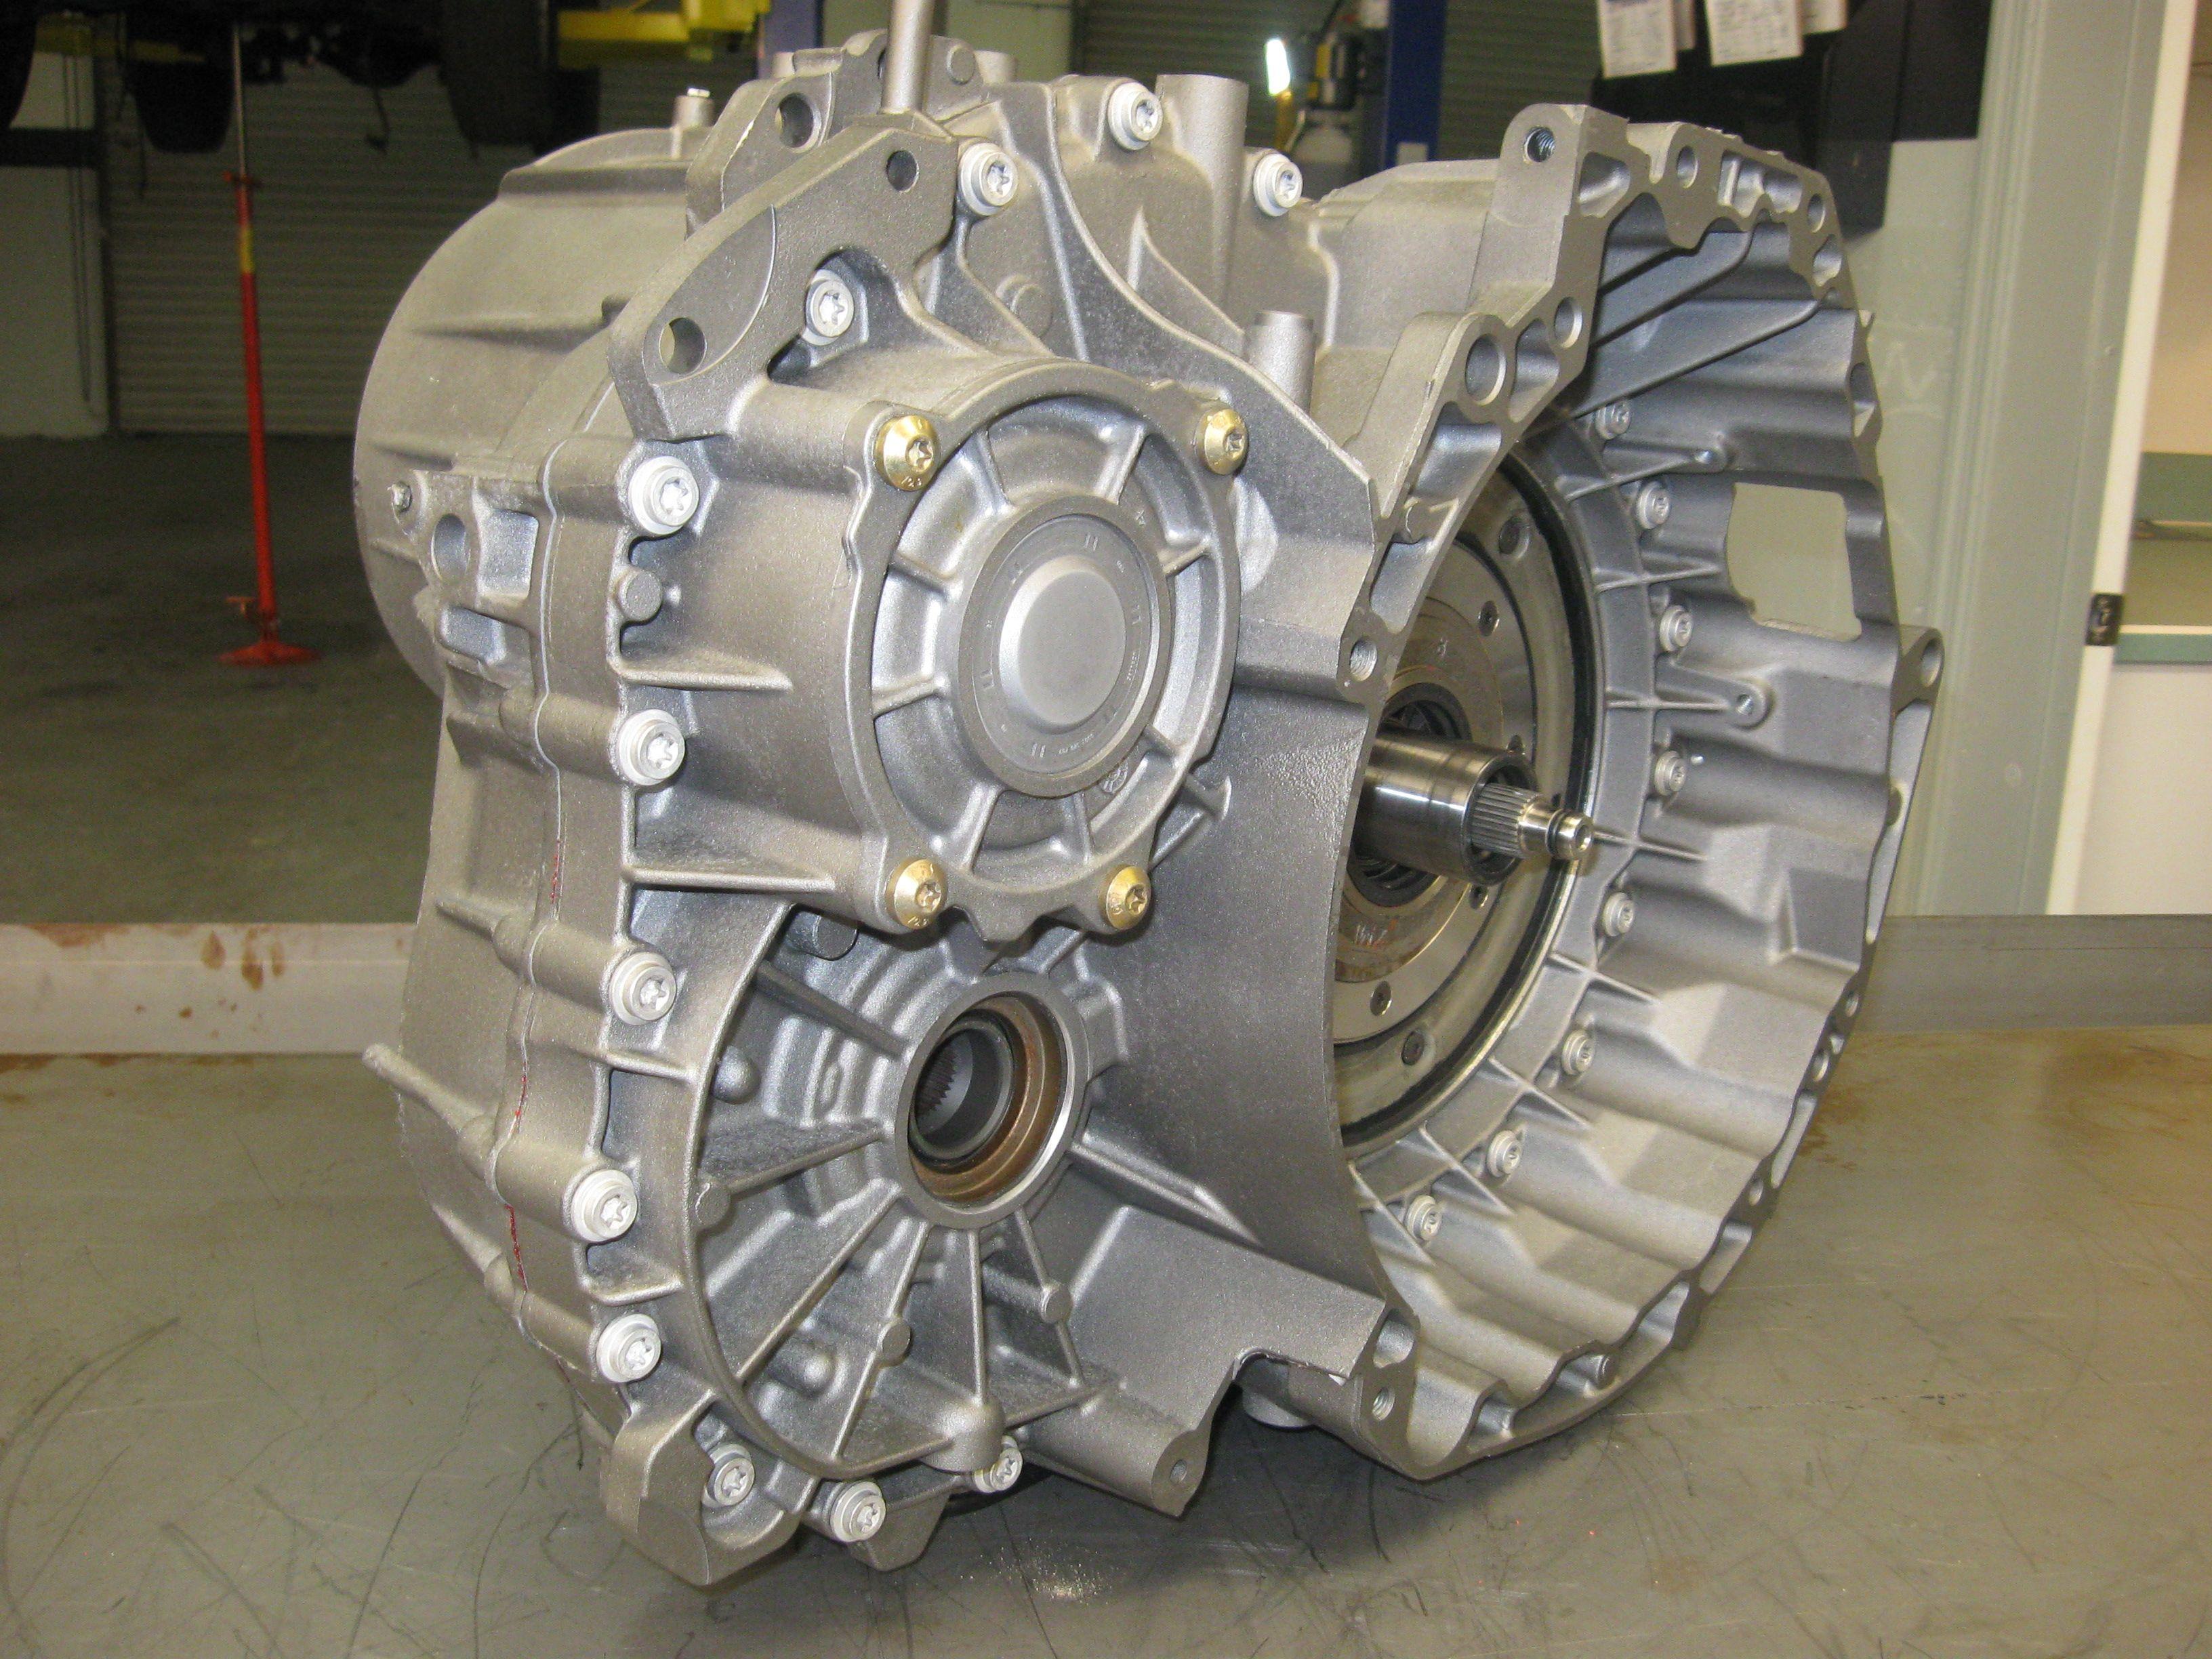 2000 audi tt used transmission description manual transmission 1 8 manual flr awd